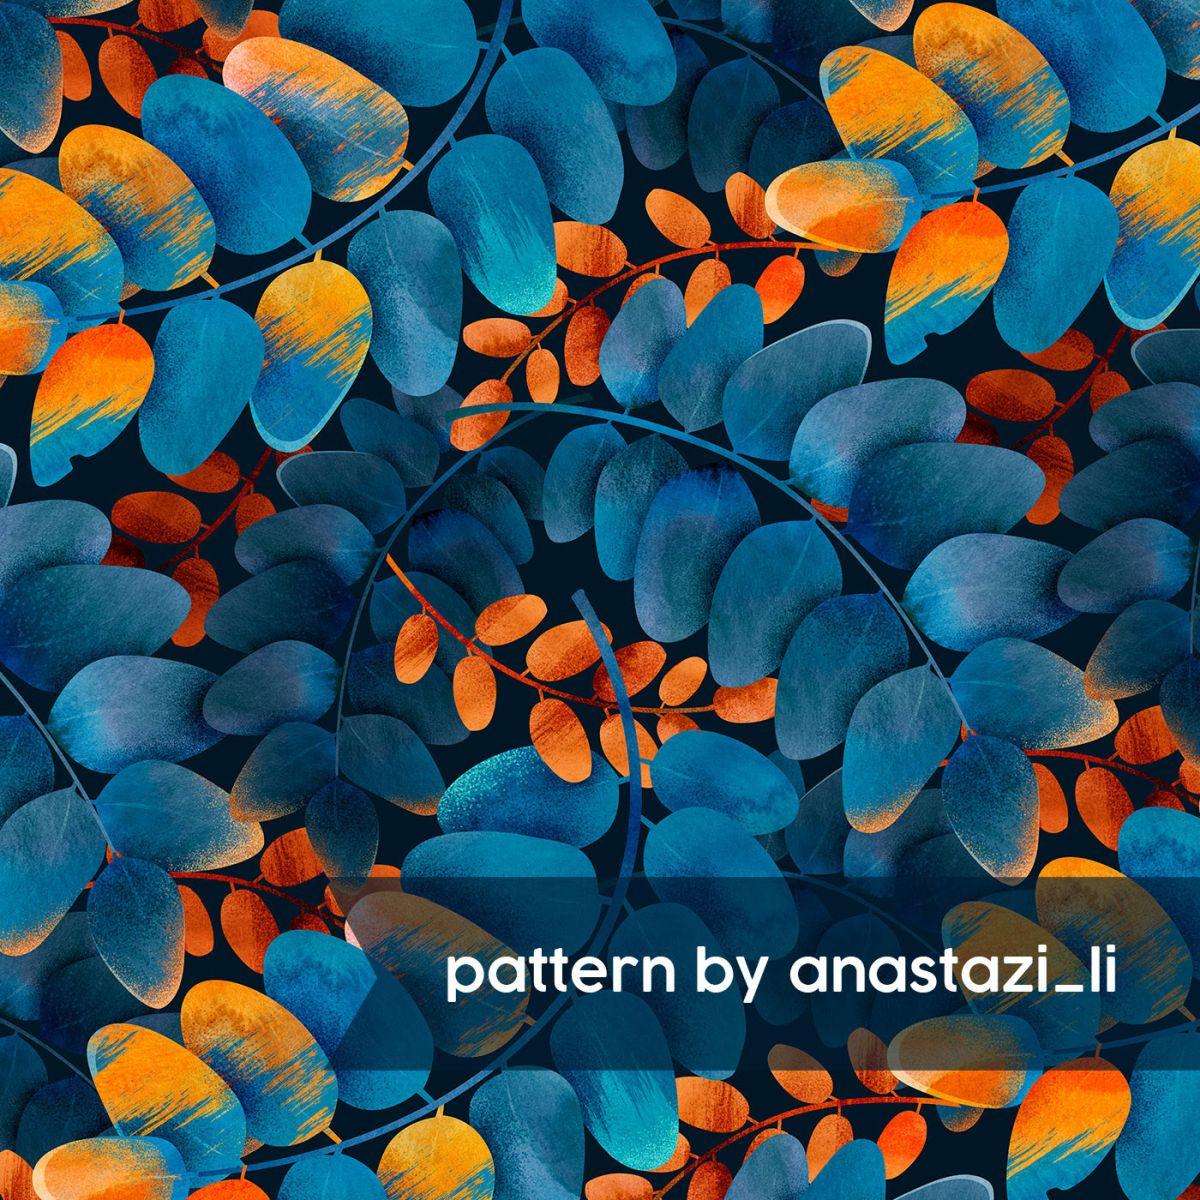 pattern illustration digital art by anastazi li